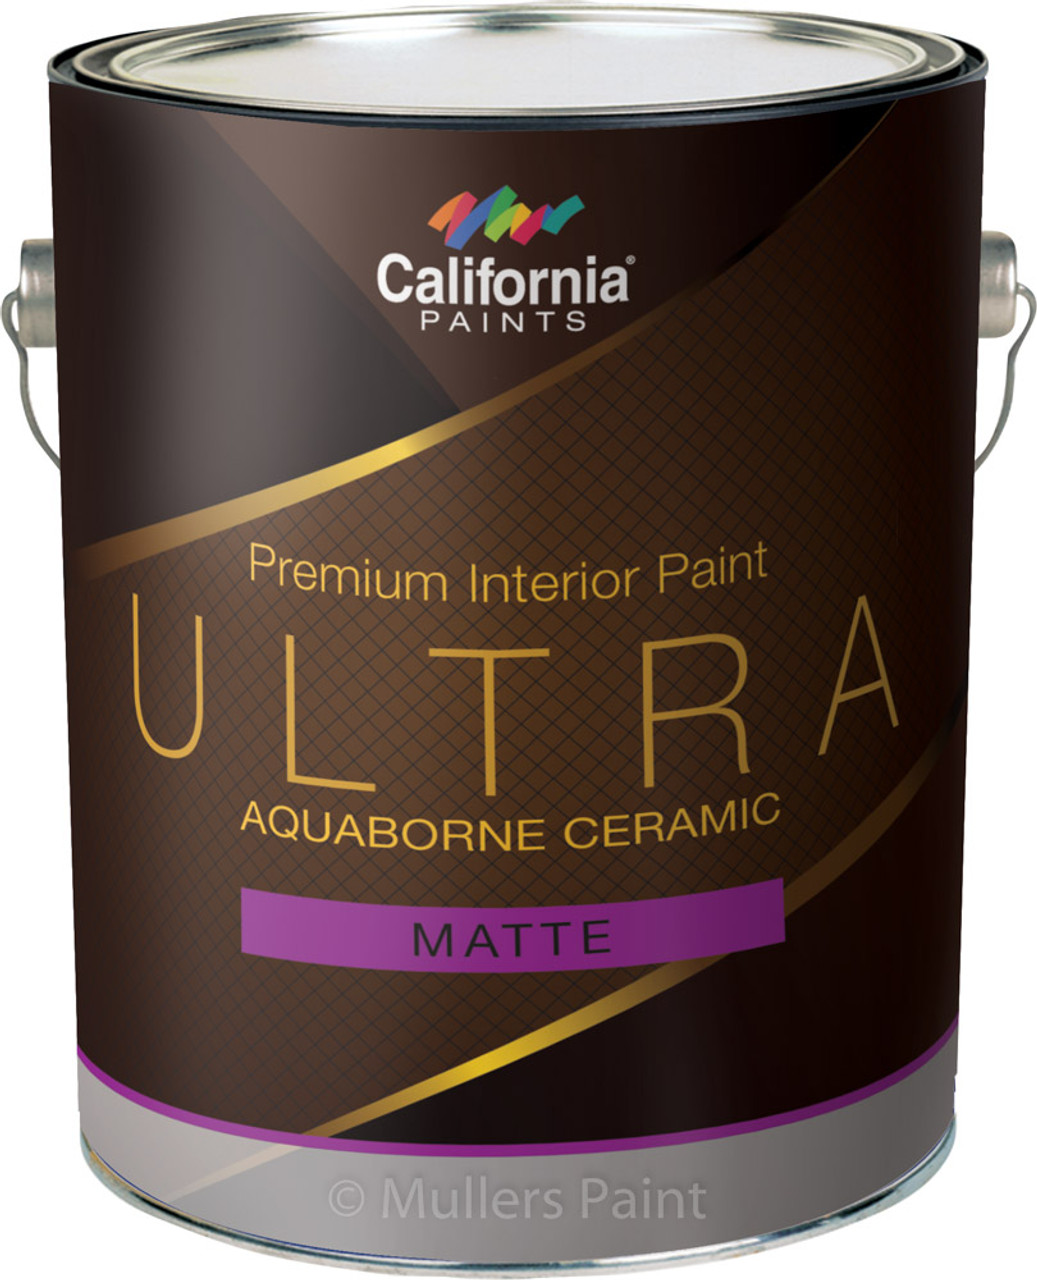 California Paints Ultra AquaBorne Ceramic Matte Paint